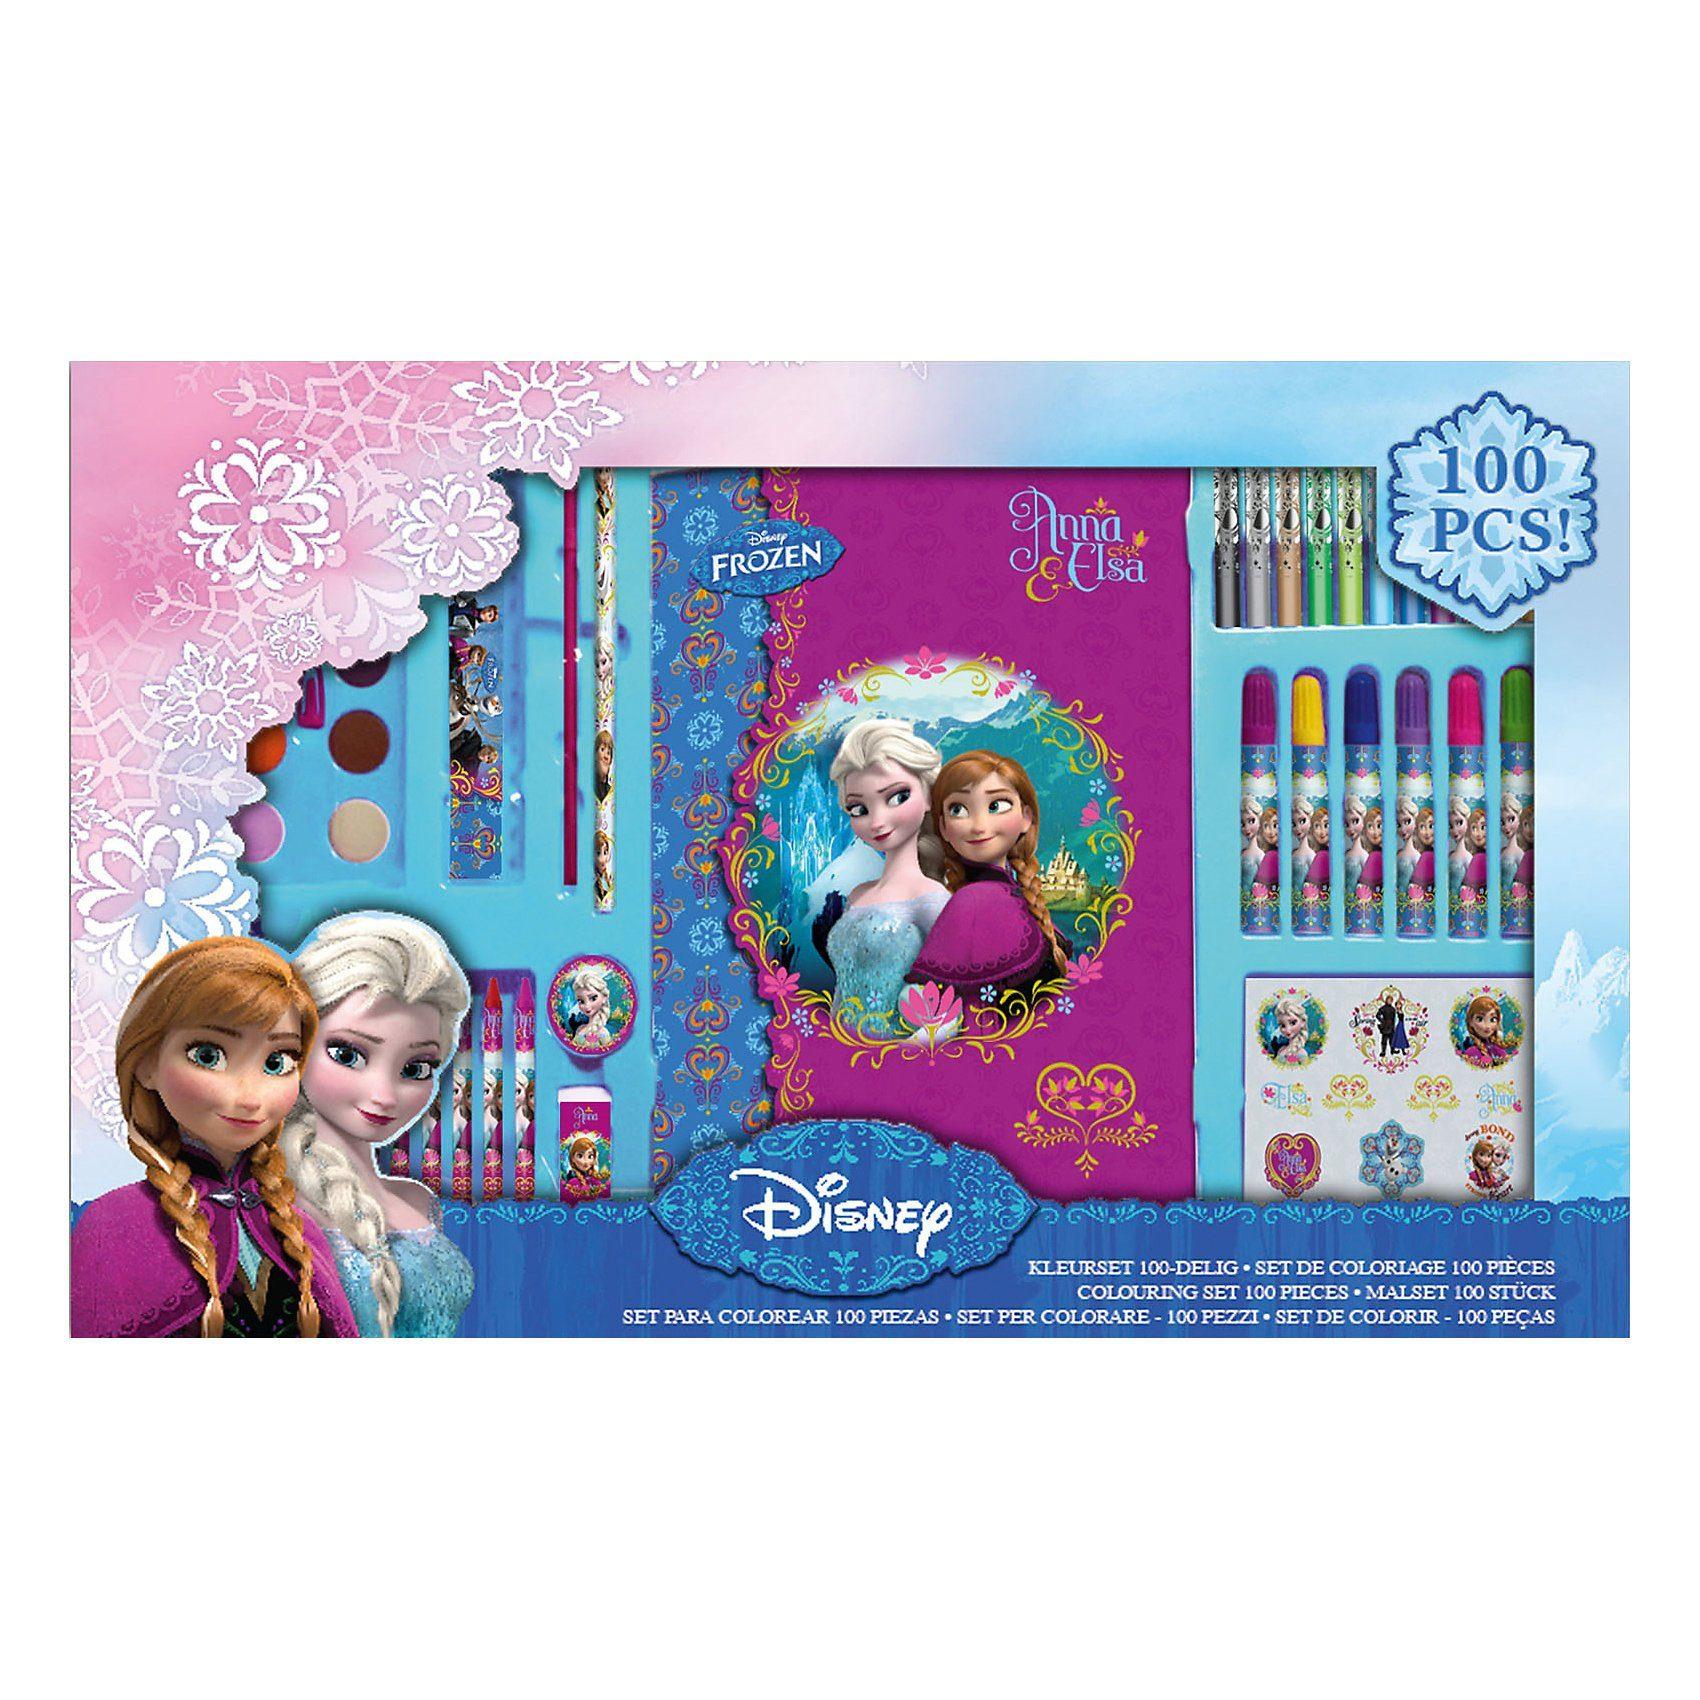 Malset XXL Disney Die Eiskönigin, 100-tlg.